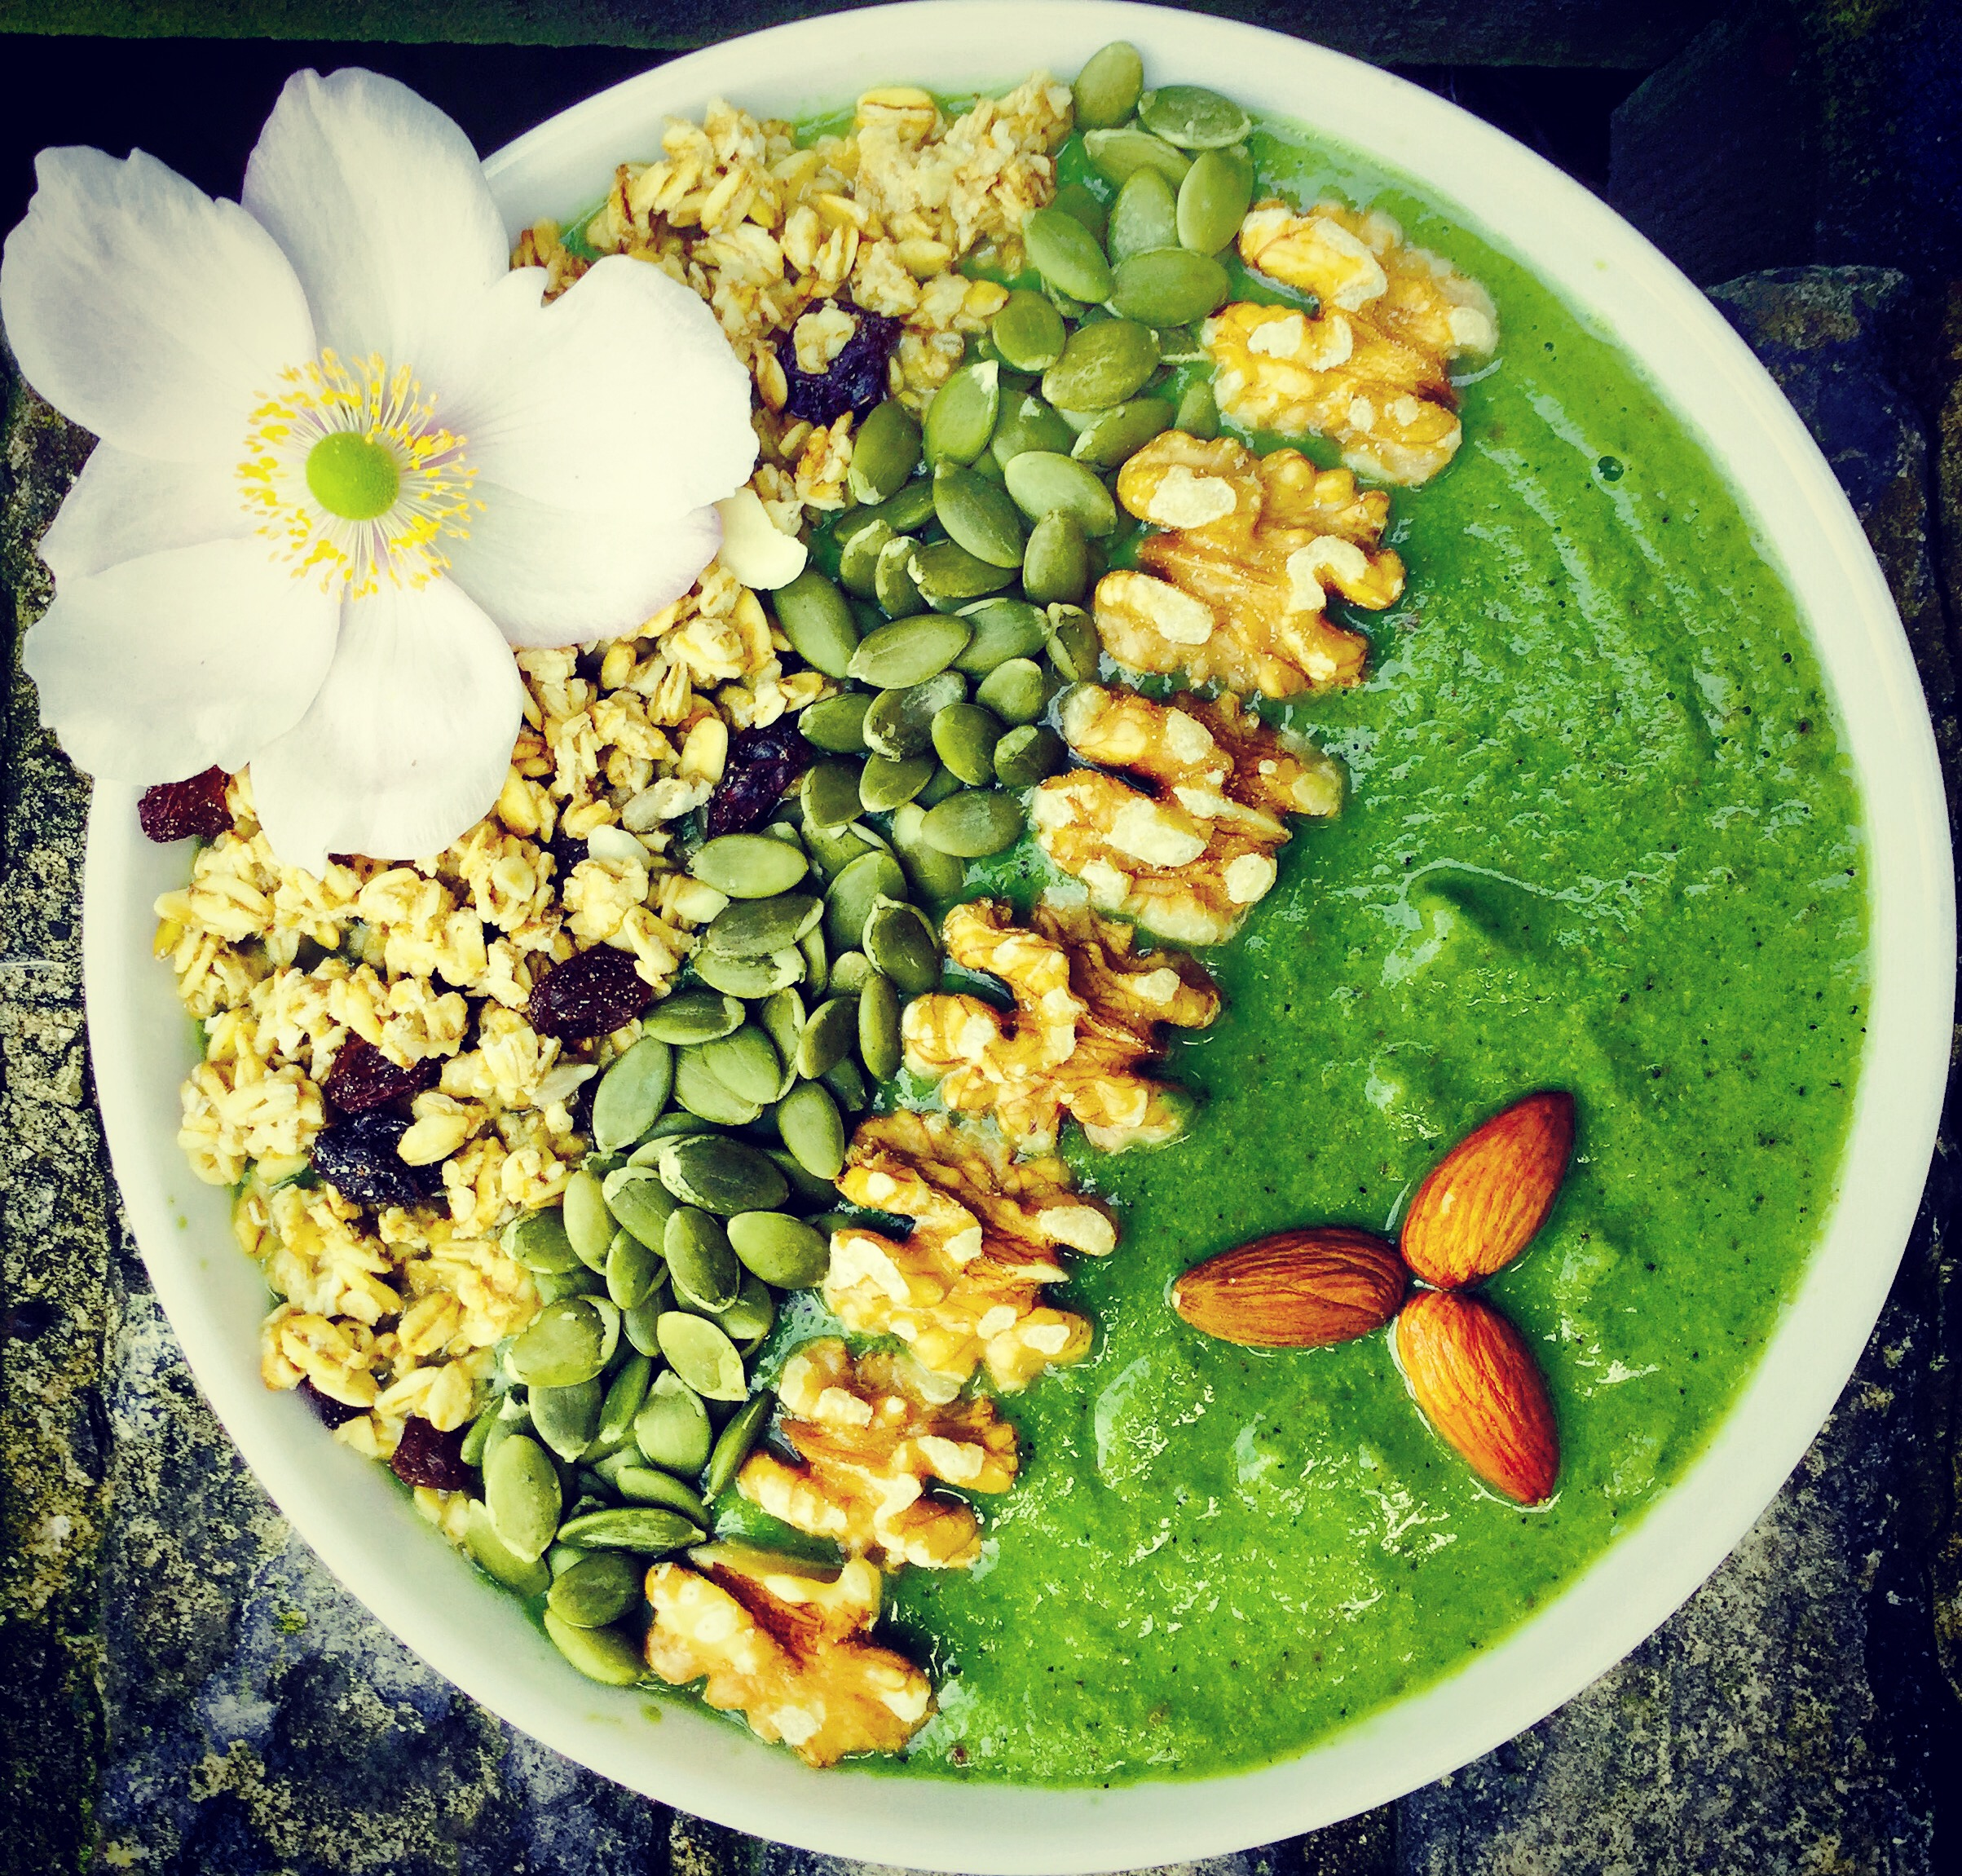 nutritious healthy autumn green smoothie bowl